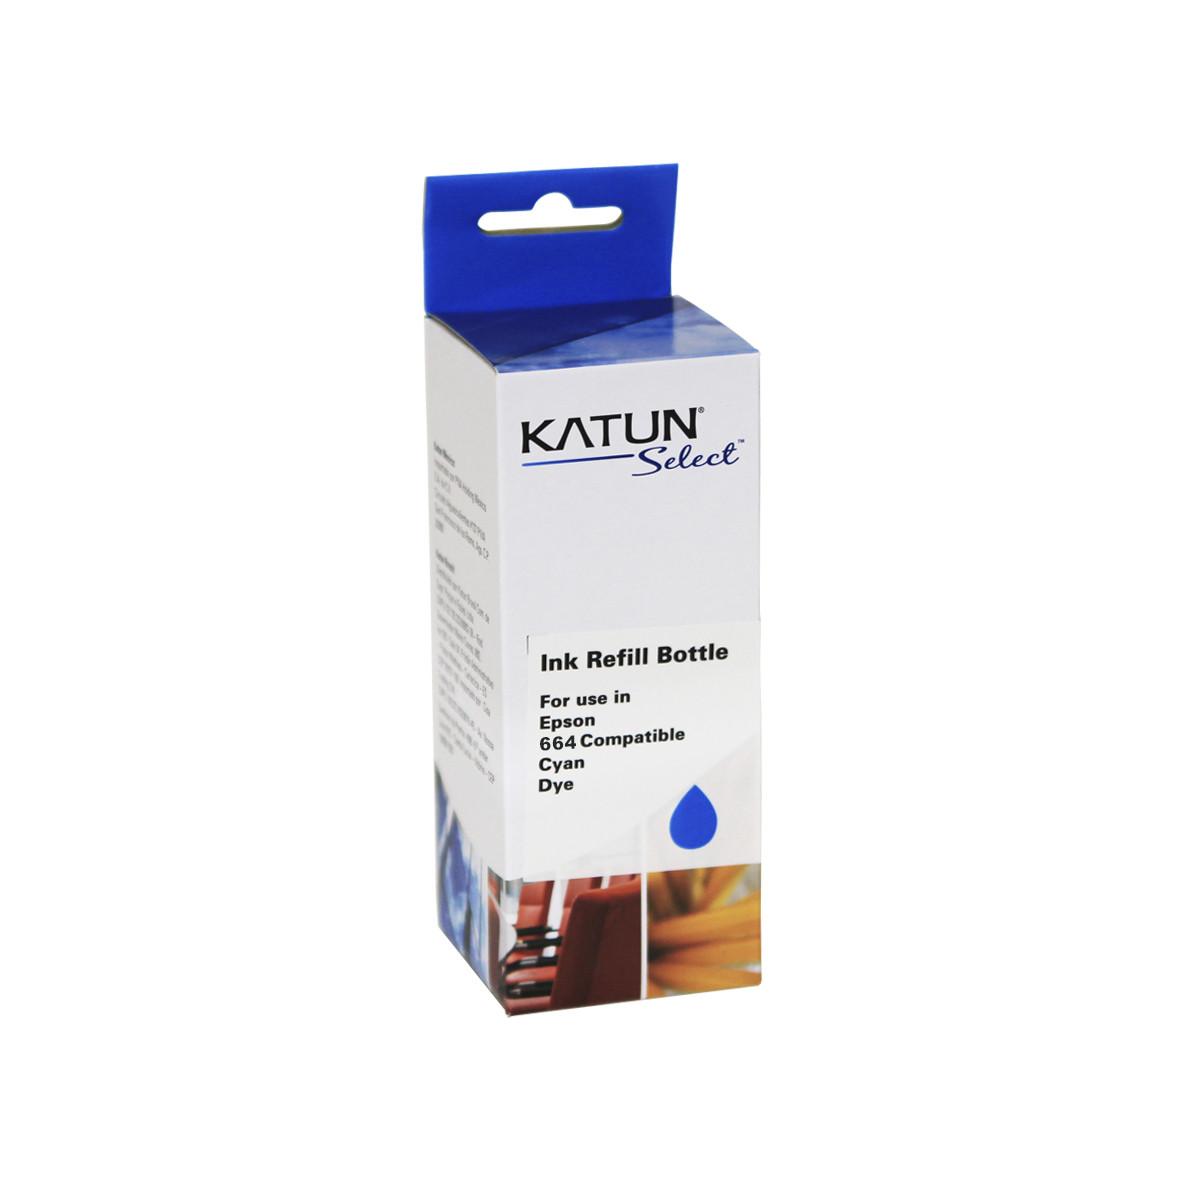 Tinta Compatível com Epson T664 T664220 Ciano   L355 L365 L555 L455 L475 L395   Katun Select 100ml